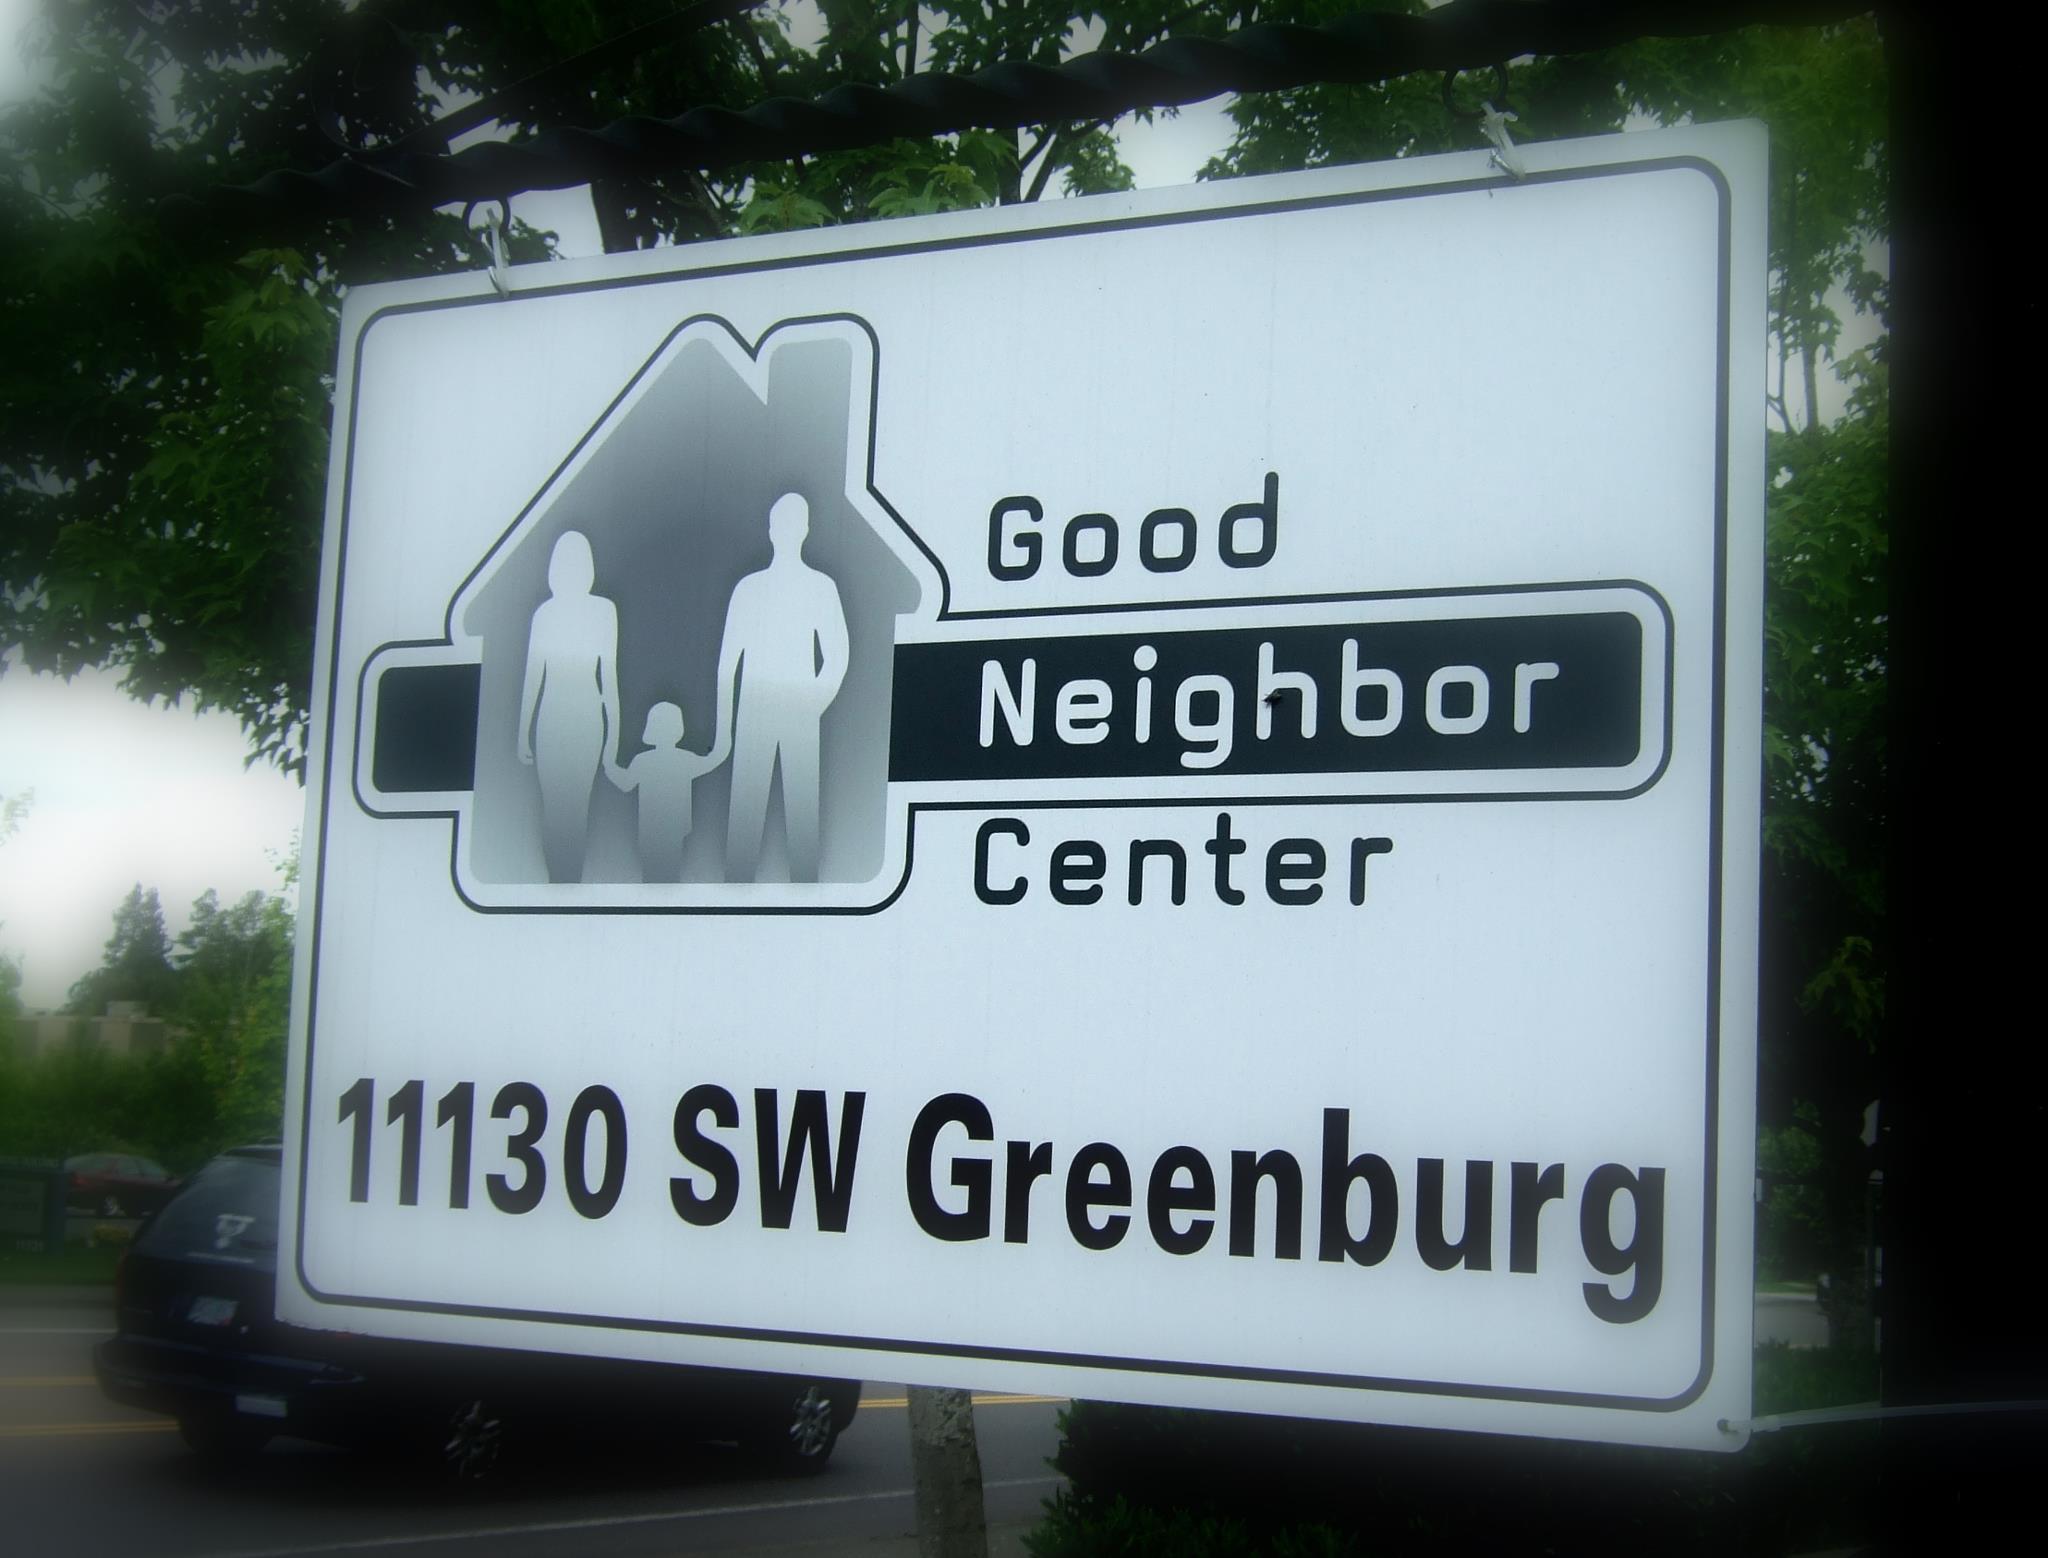 Good Neighbor Center